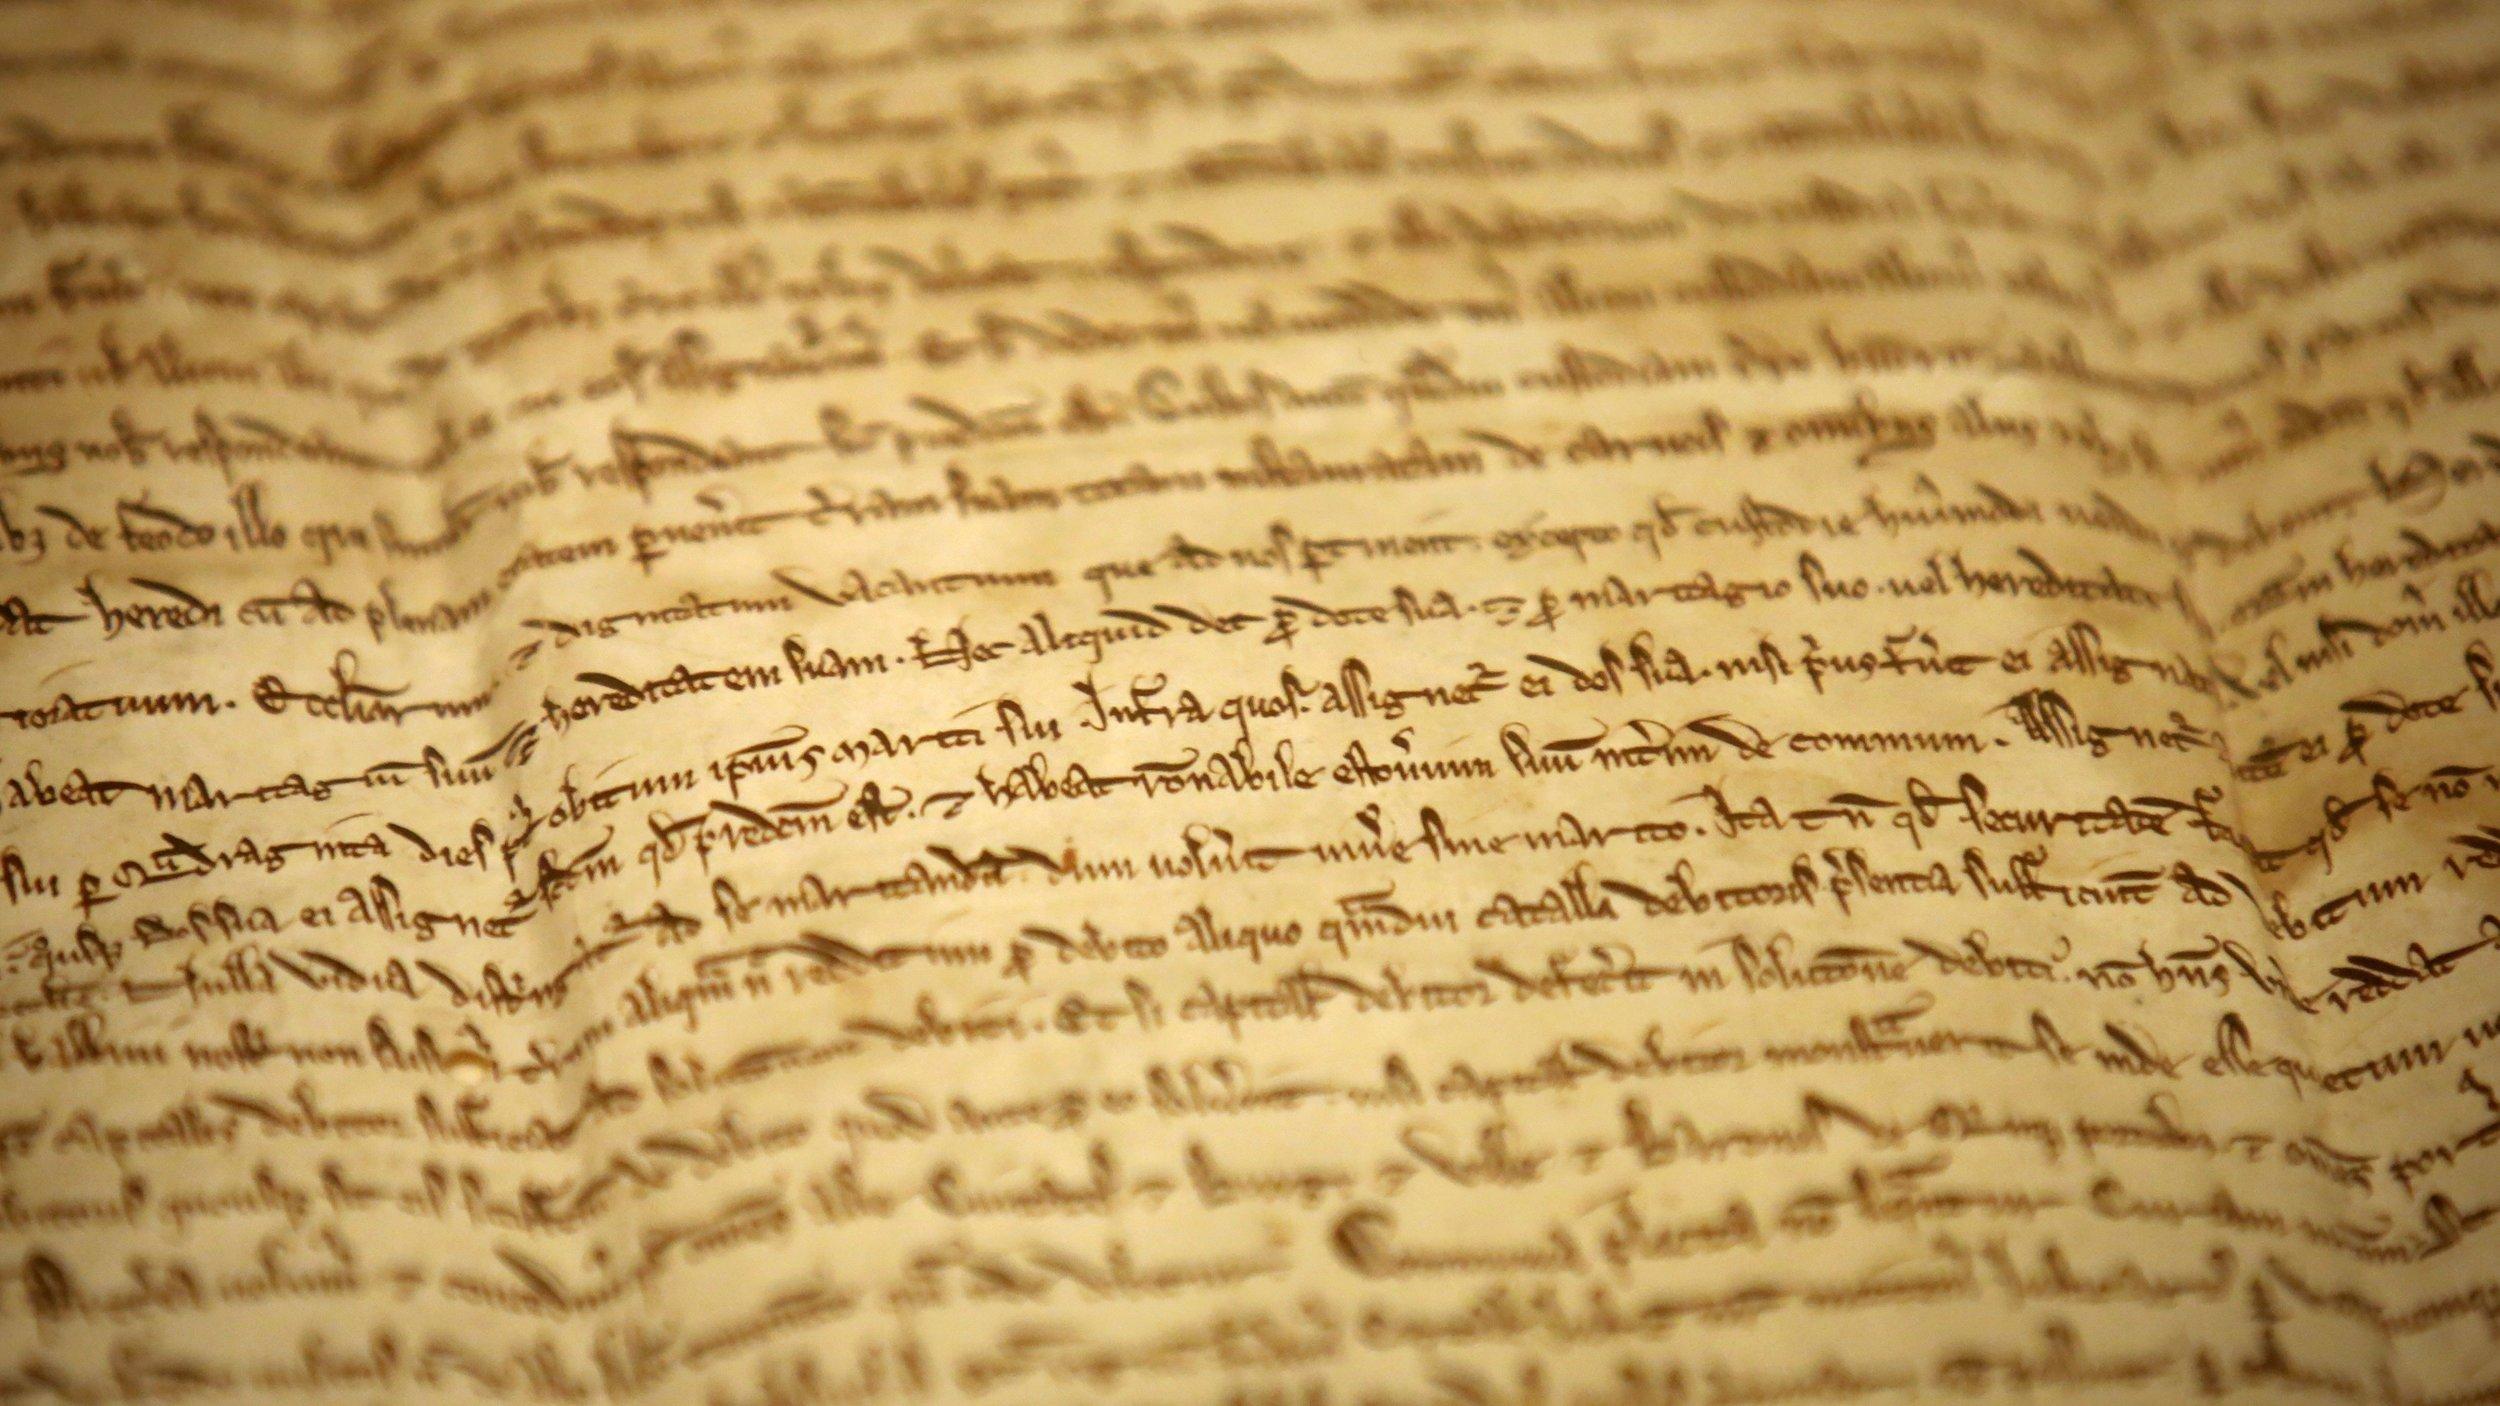 a close up view of the Magna Carta